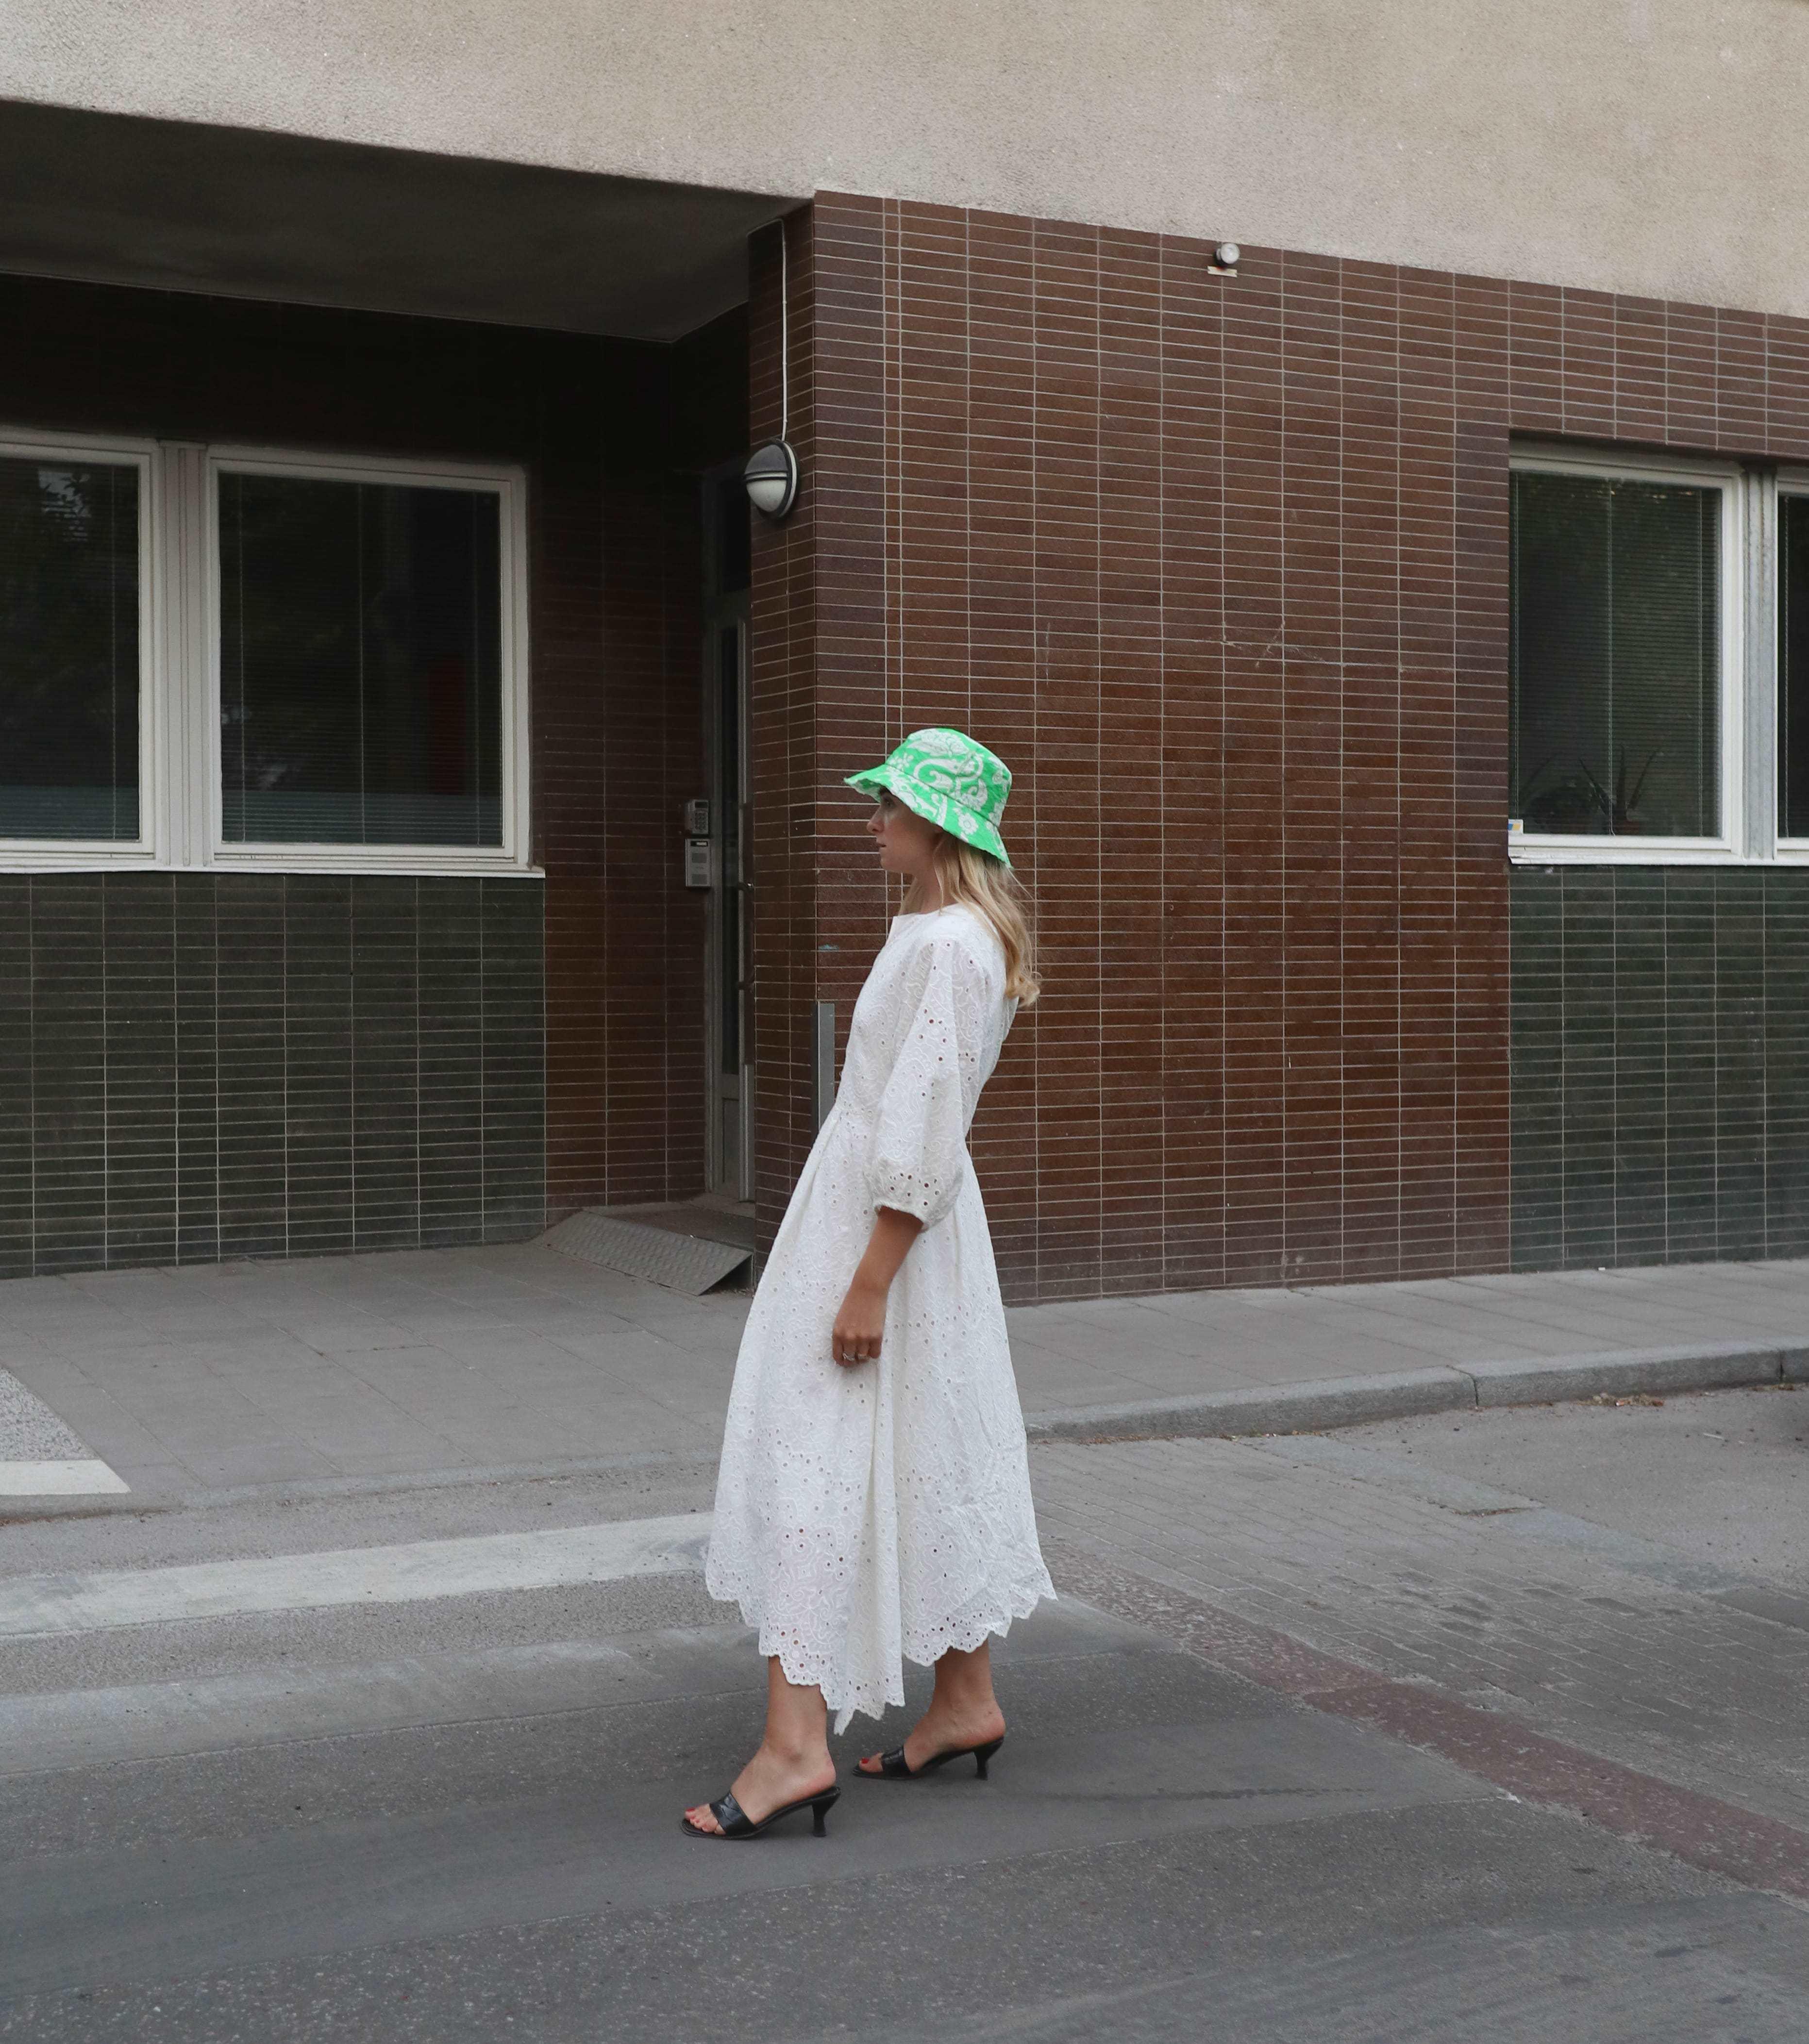 Feet Paola Saulino nude photos 2019